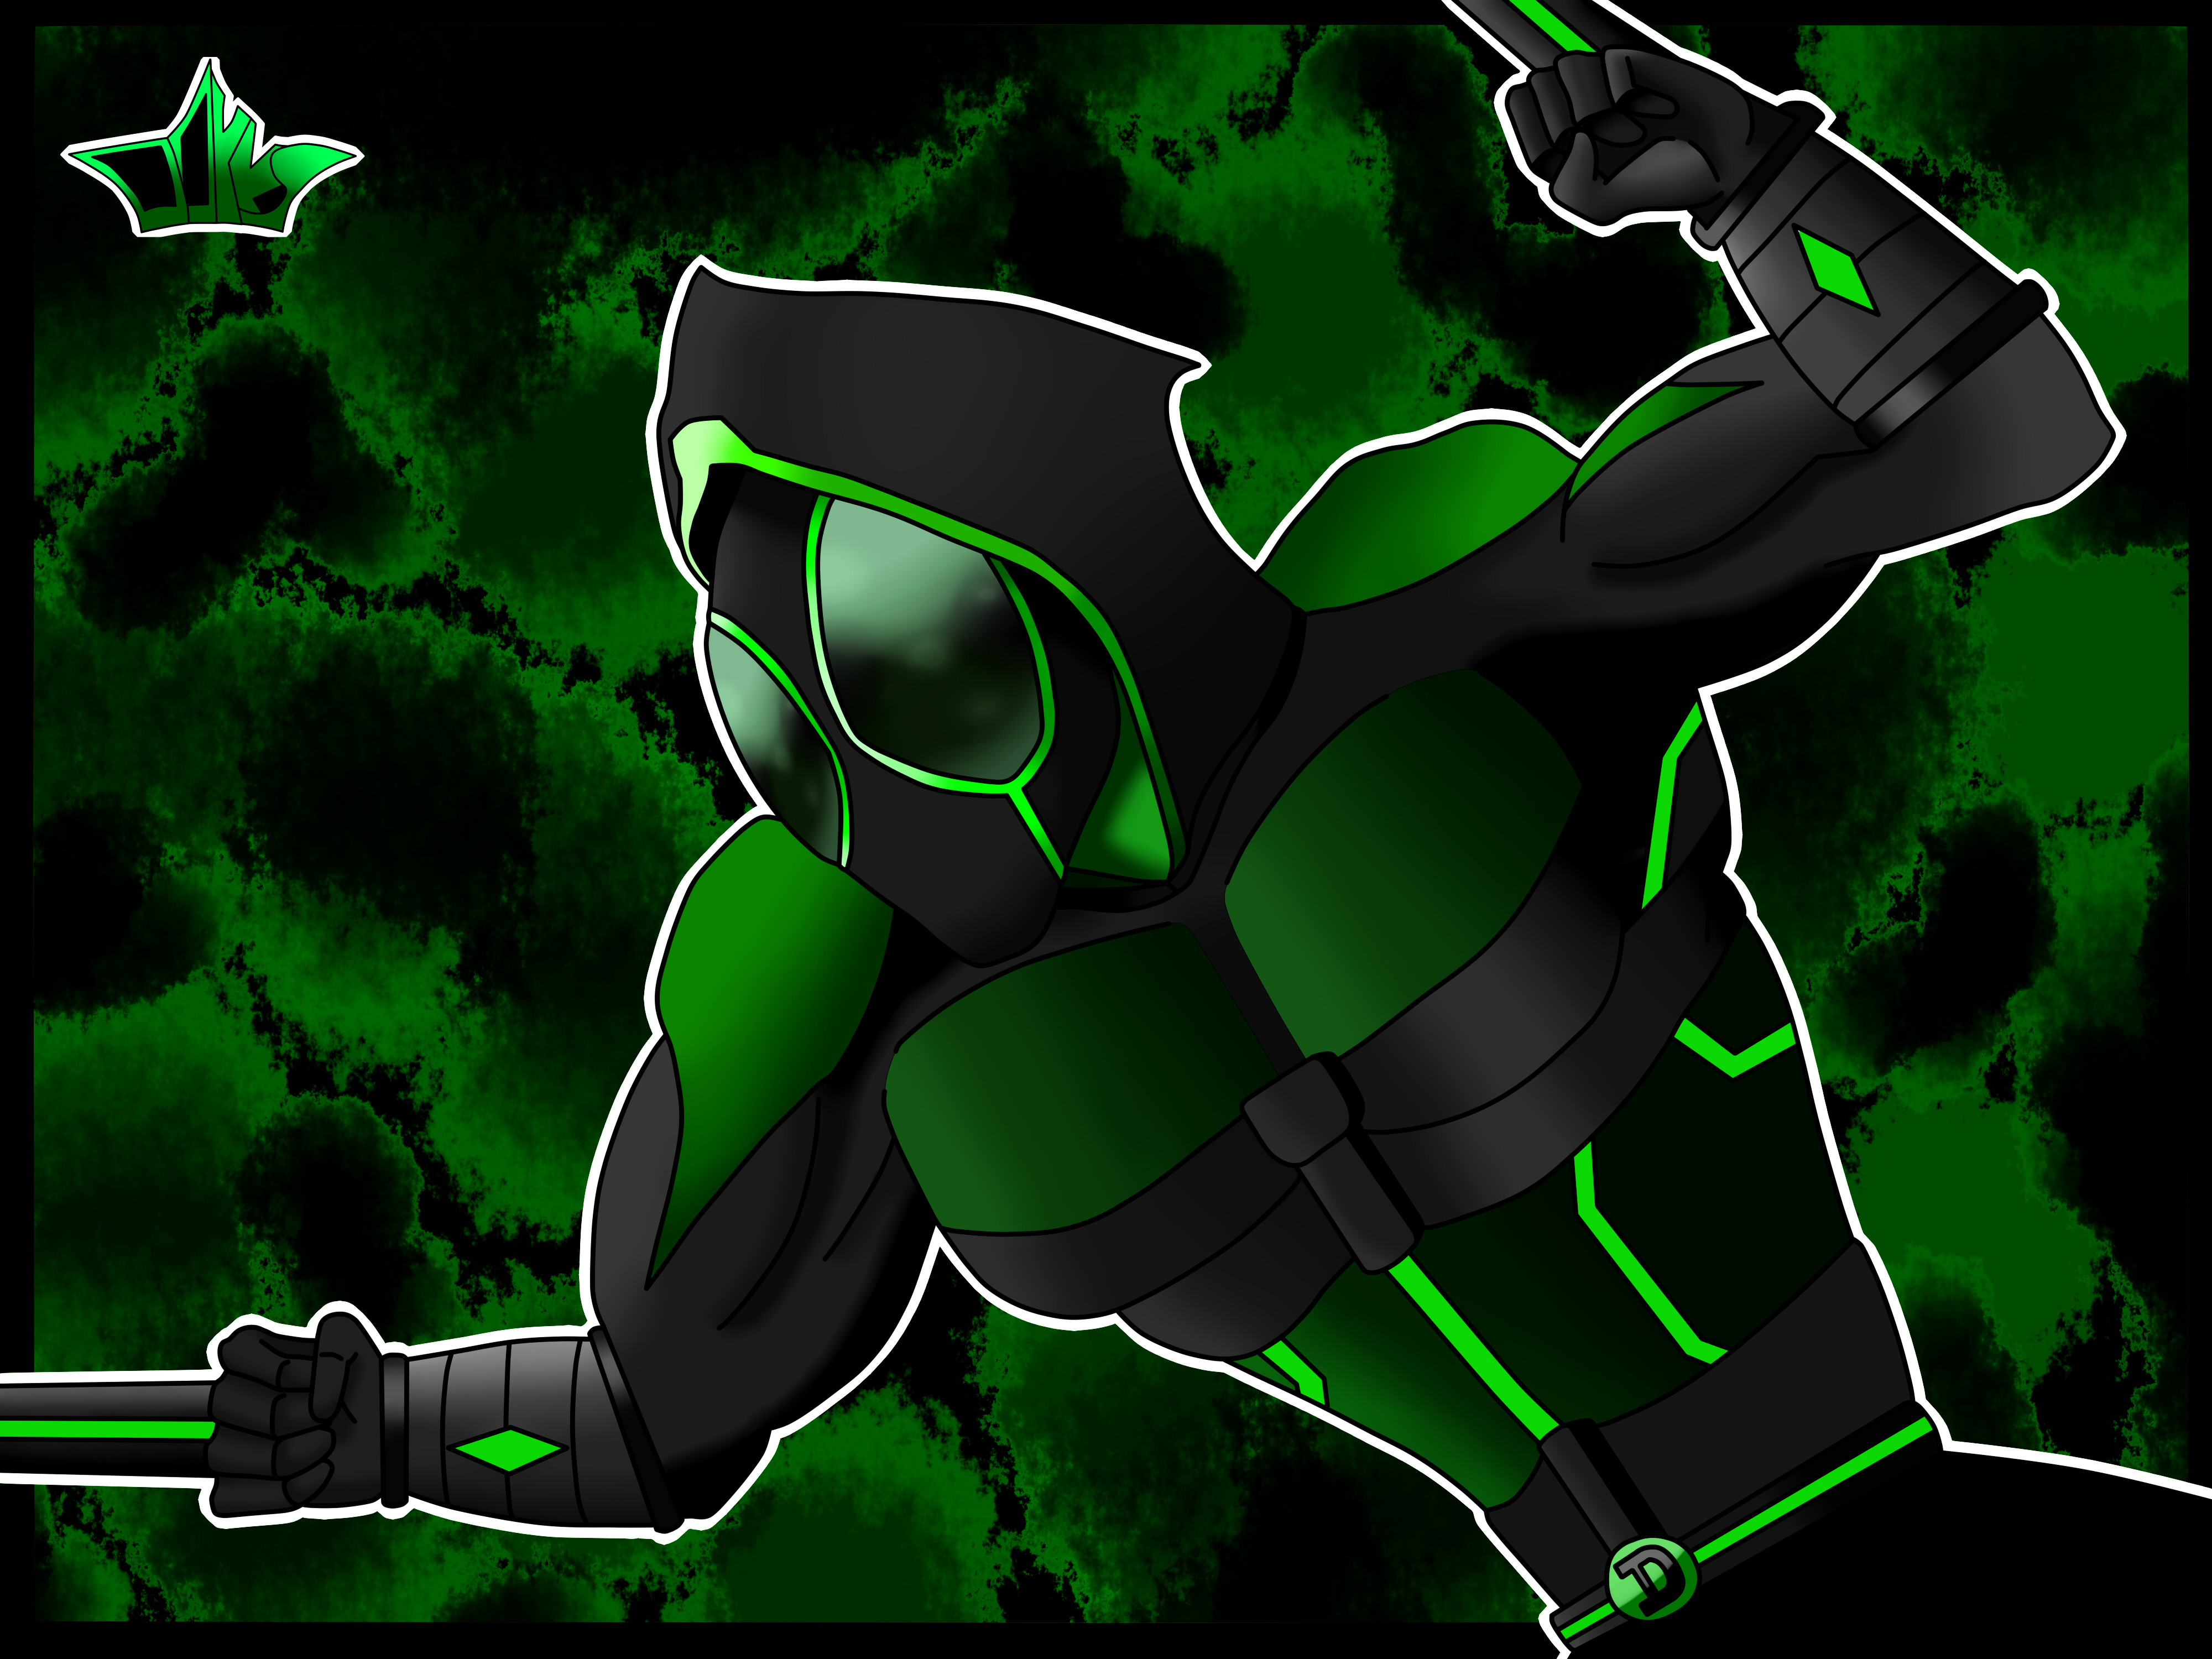 Daxxs Hunter 2